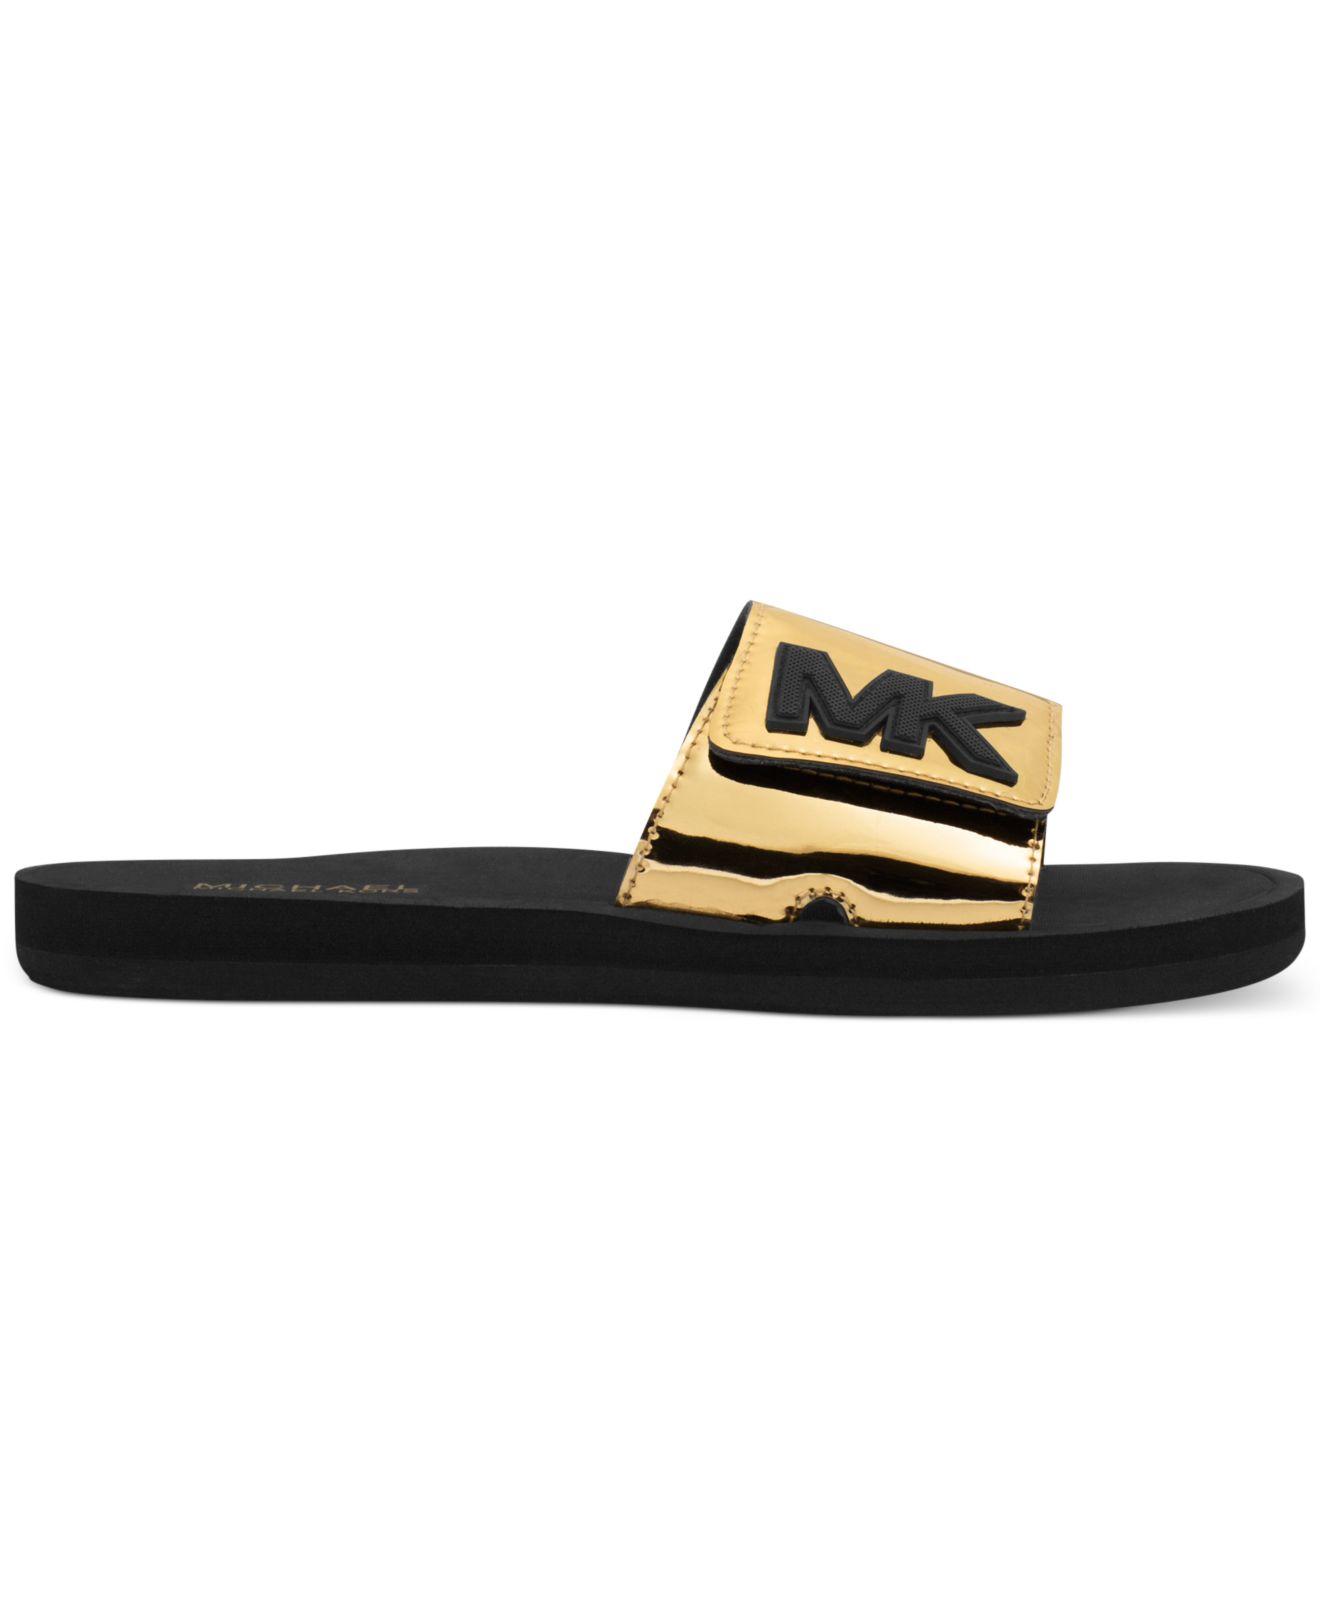 0386ef4c62d2 ... Michael kors Metallic-Leather Slides in Metallic Lyst ...